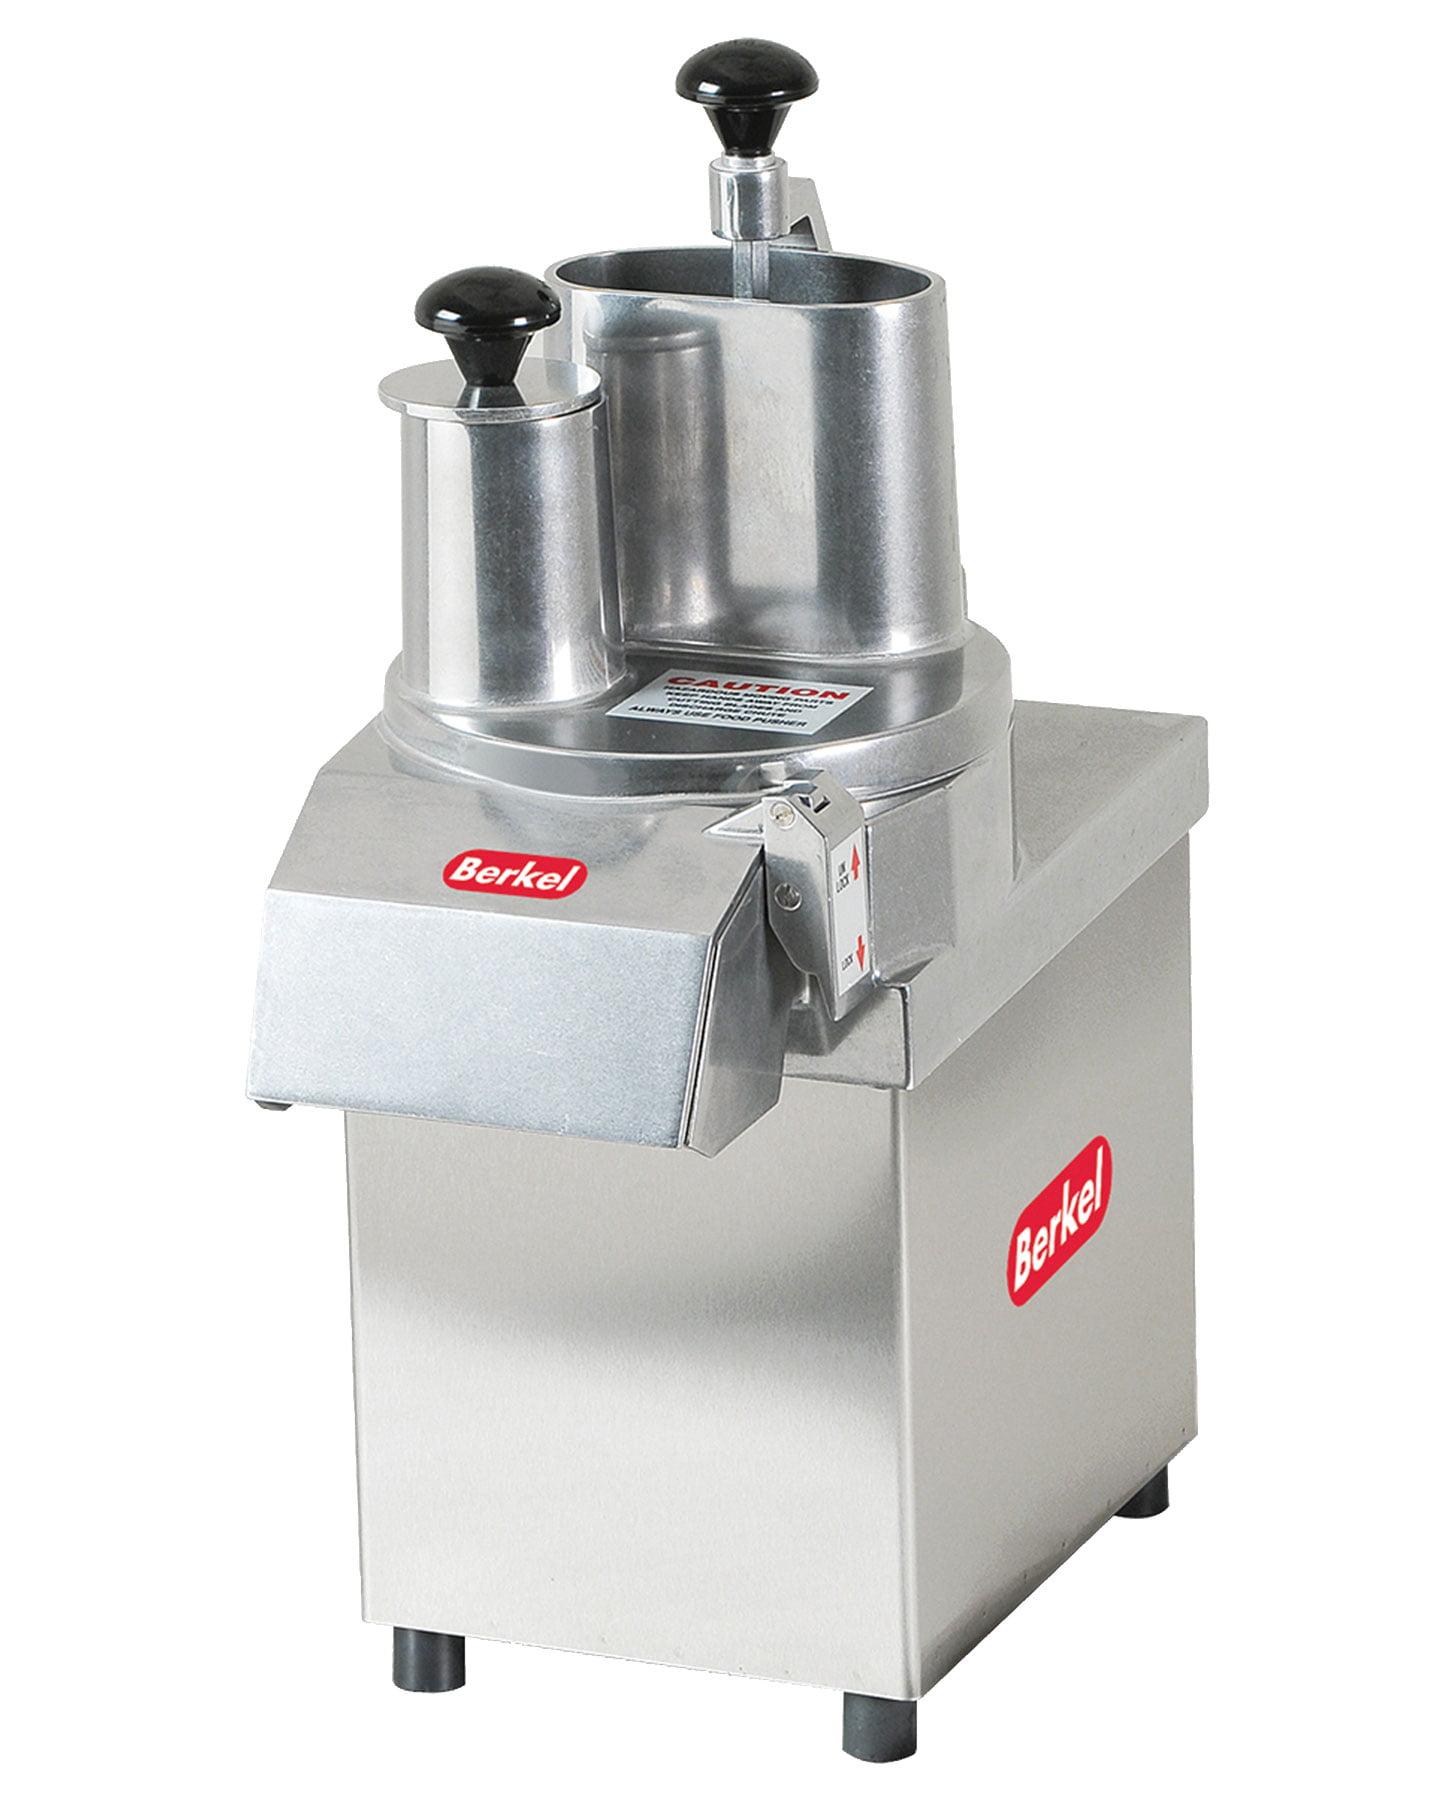 Berkel-food-processor